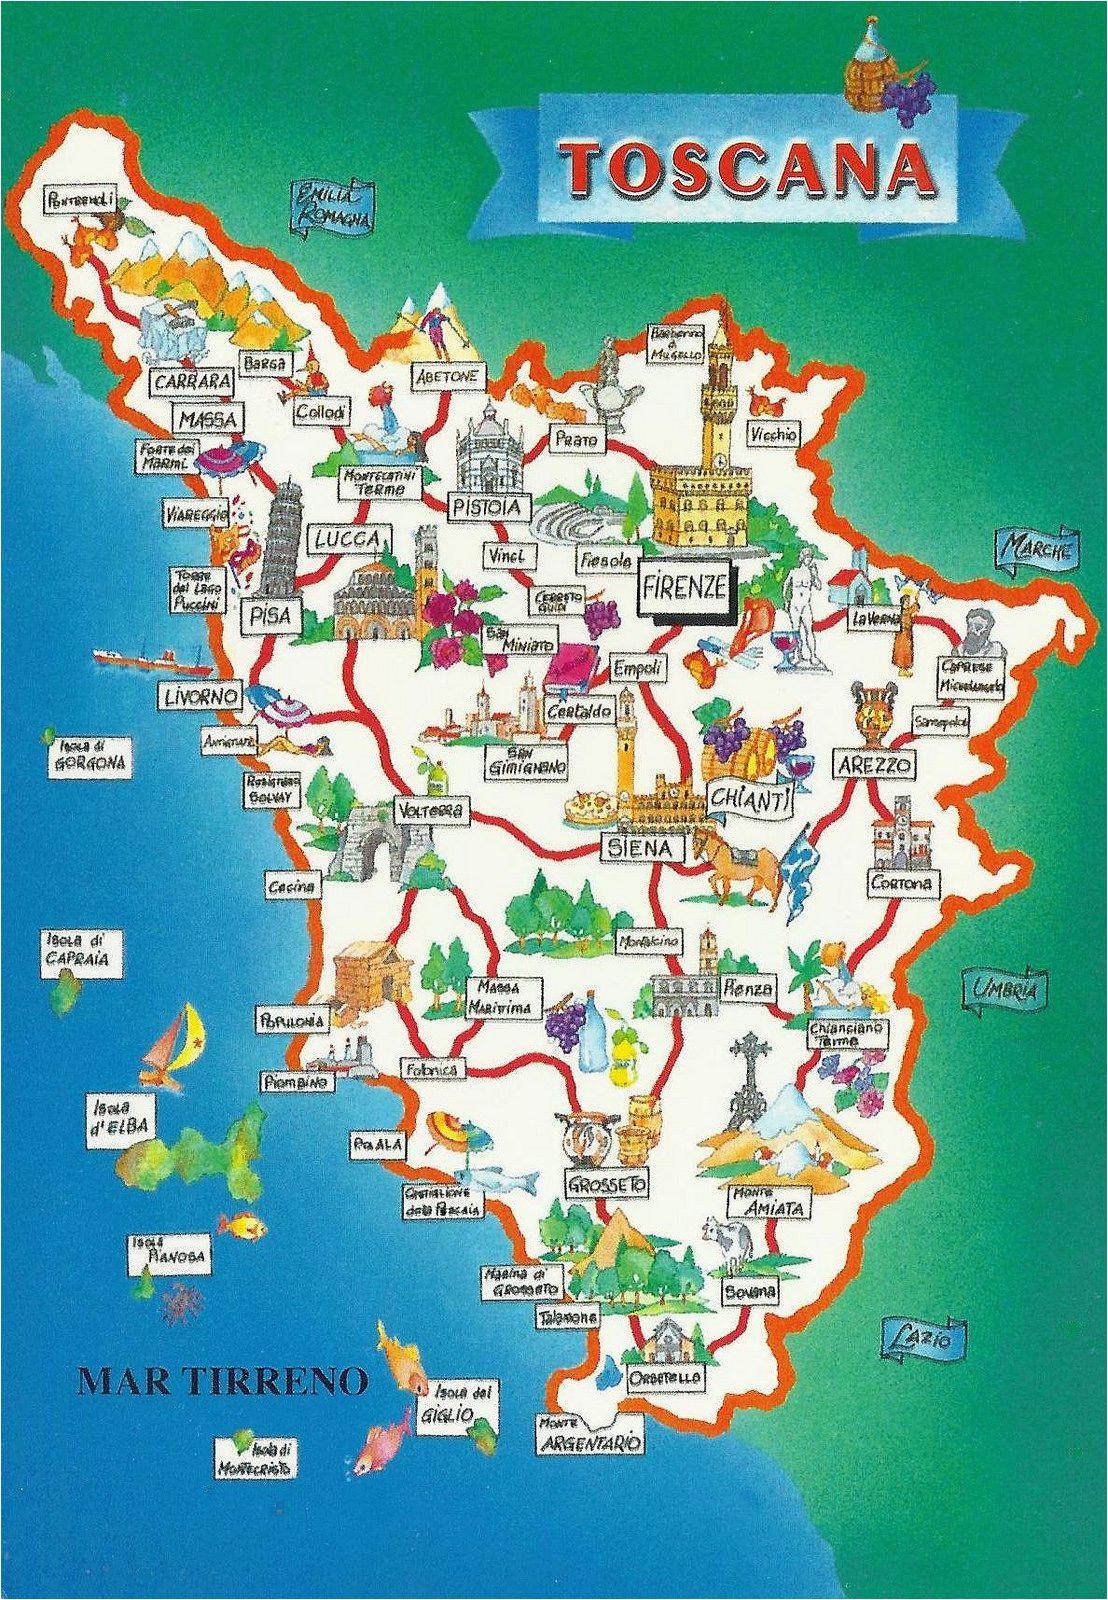 Map Of Tuscany In Italy.Tuscany On Italy Map Secretmuseum